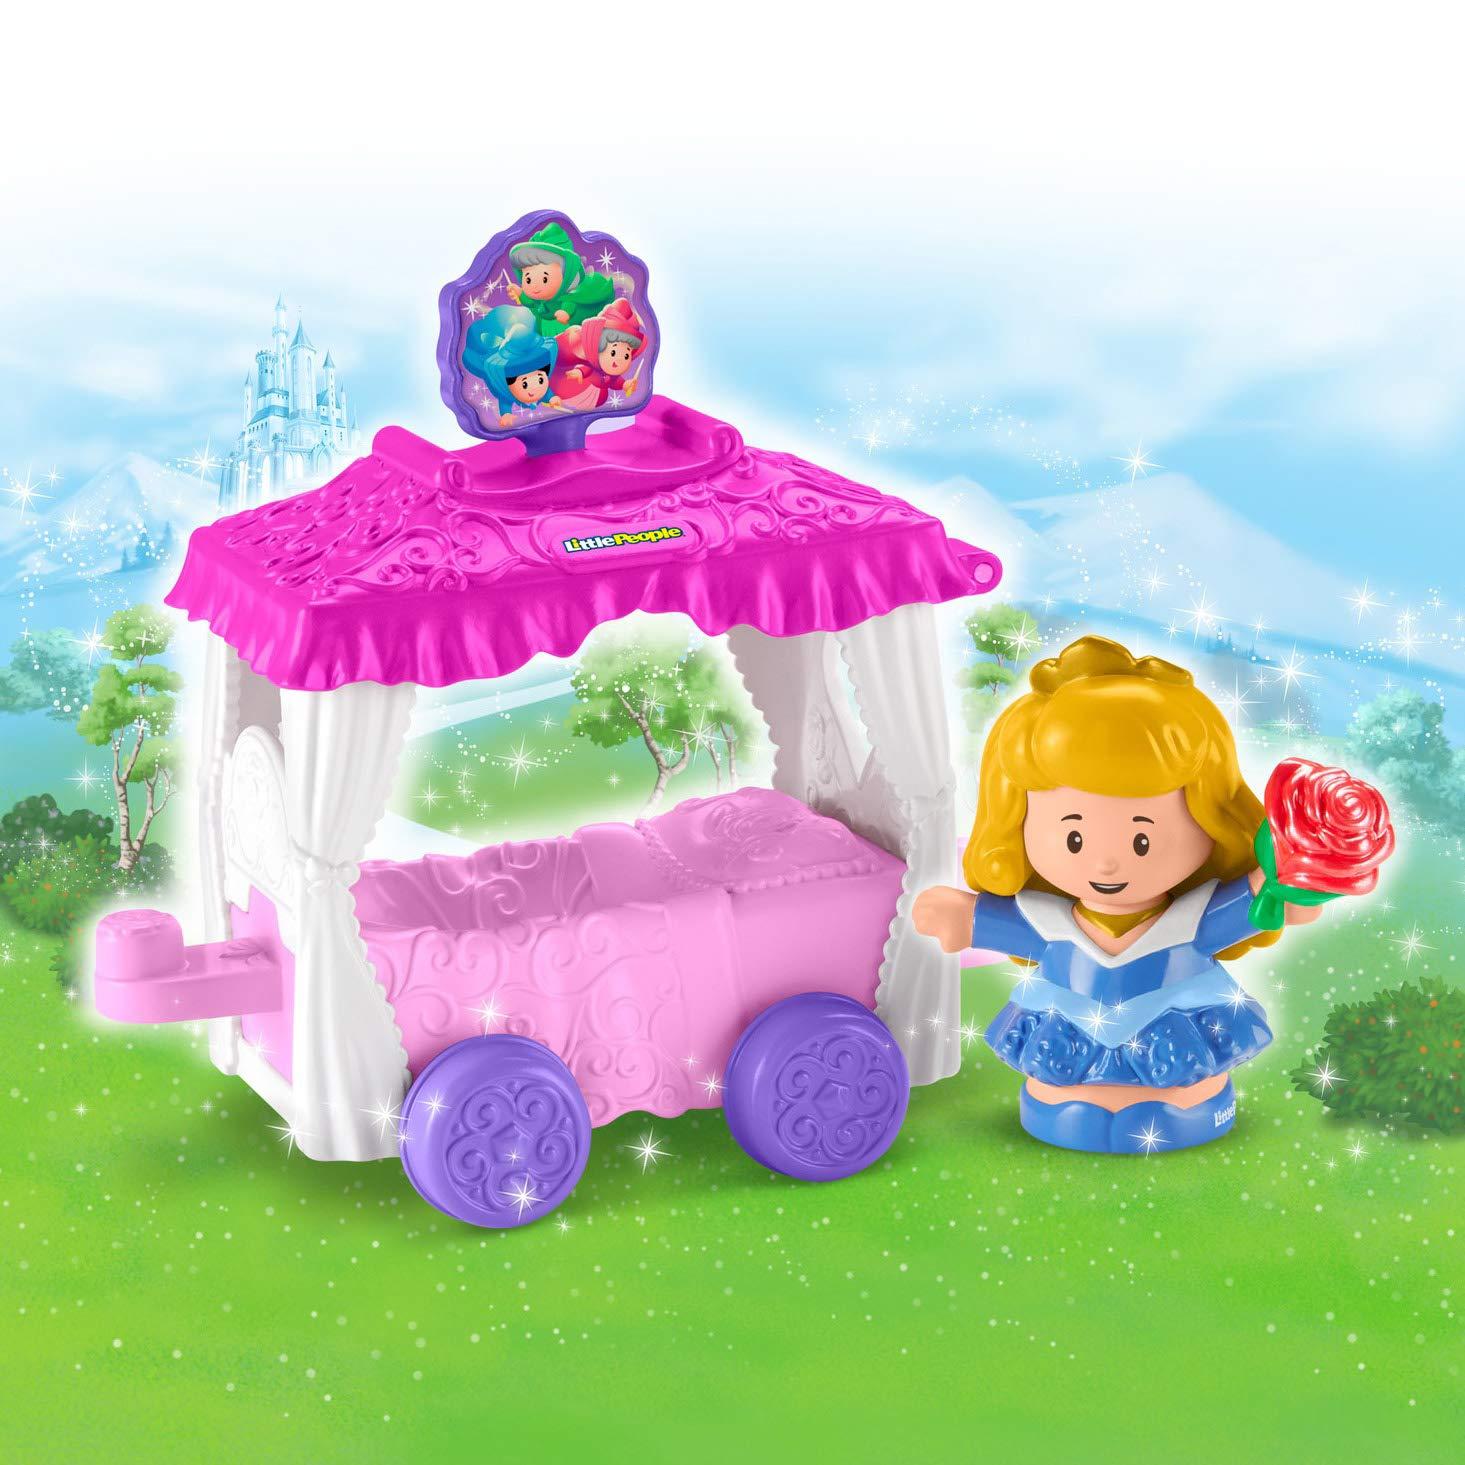 Amazon.com: Fisher-Price Little People Disney Princess Parade Aurora & Fairy Godmothers Float: Toys & Games